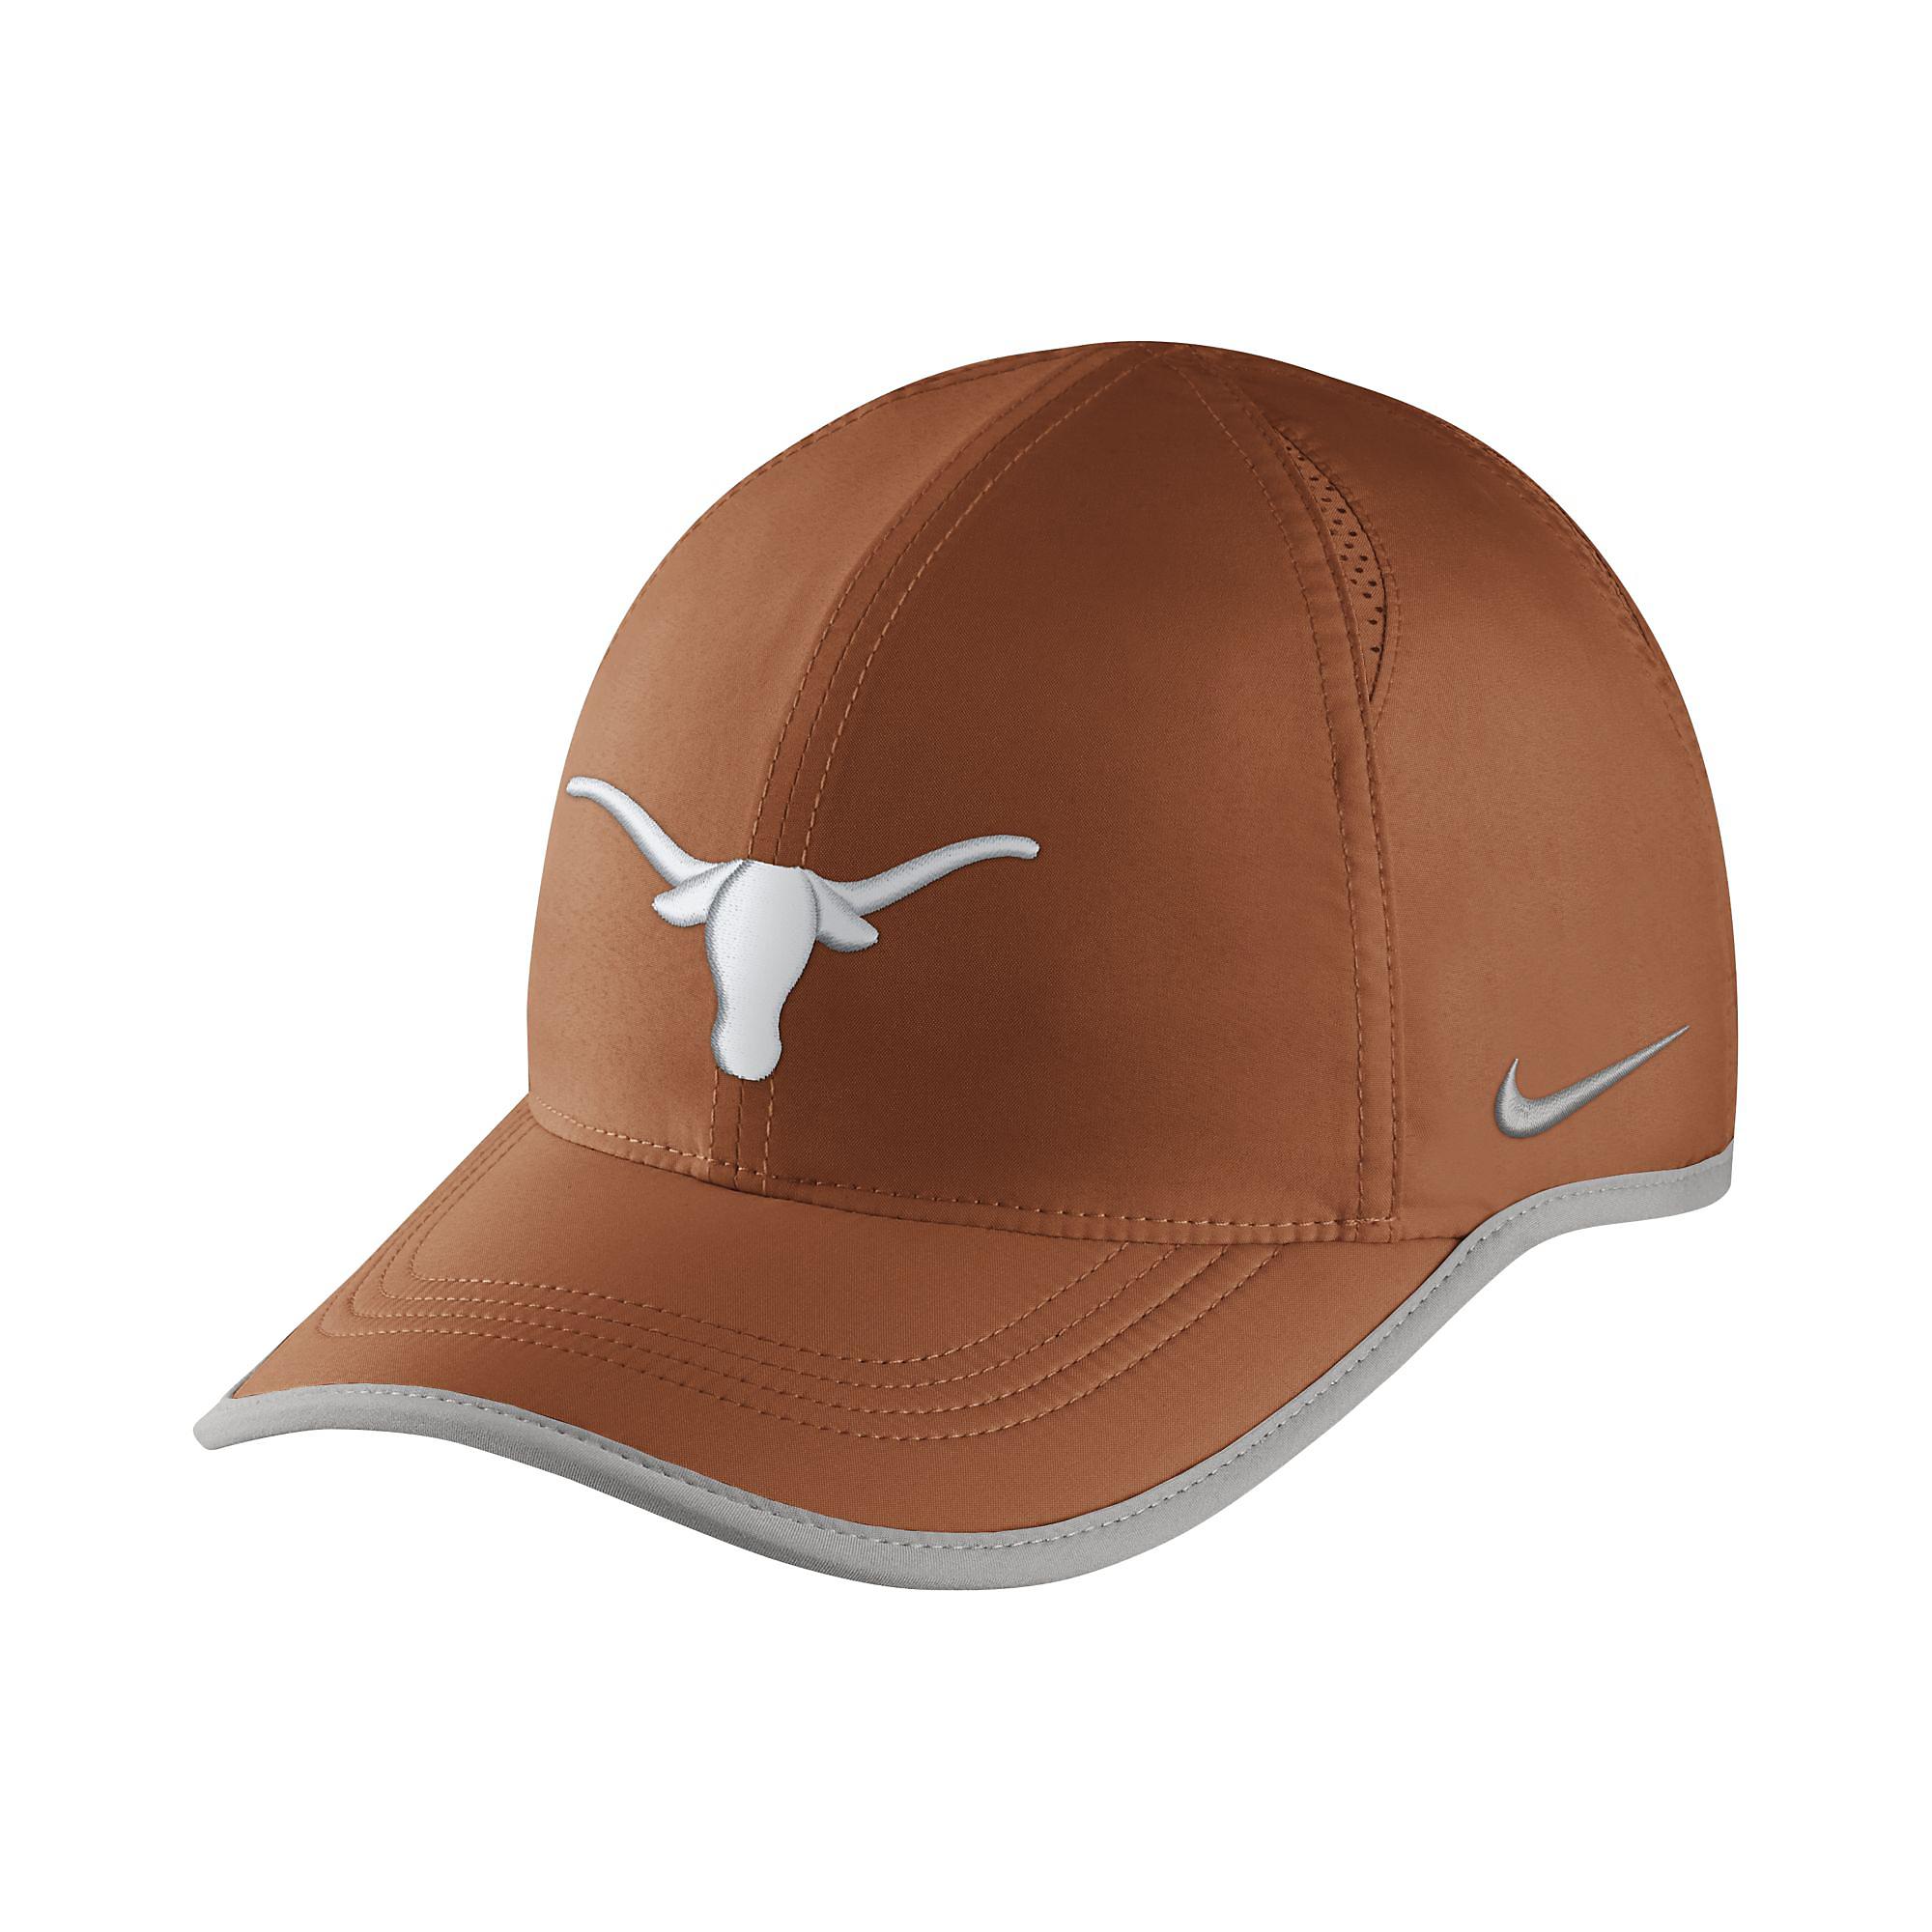 online store 48ee5 5c6cf Texas Longhorns Nike Featherlight Aerobill Cap   Fans United